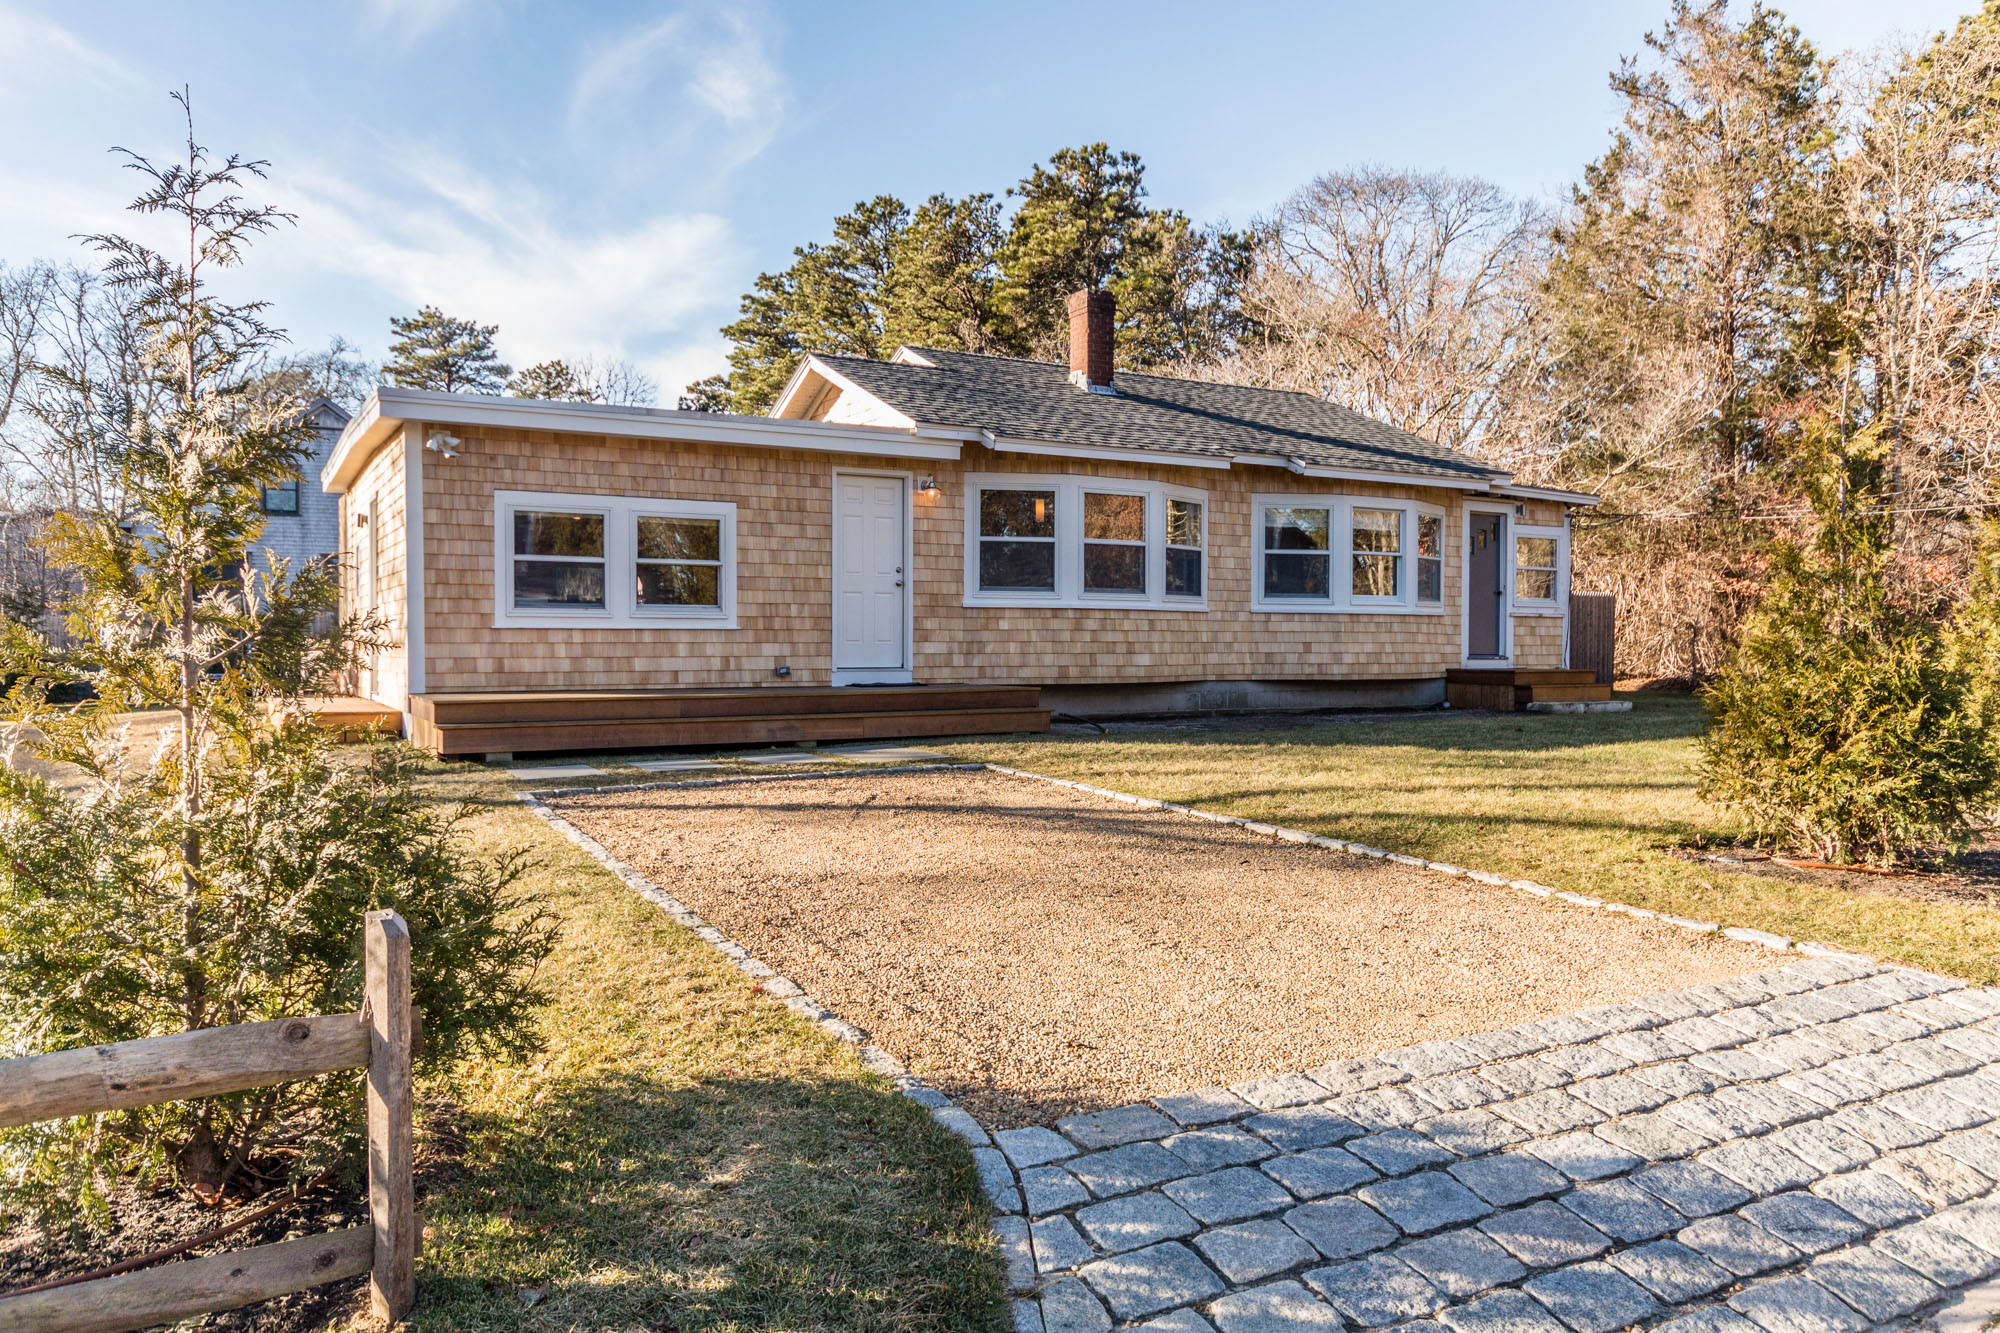 Martha's Vineyard Homes in Oak Bluffs